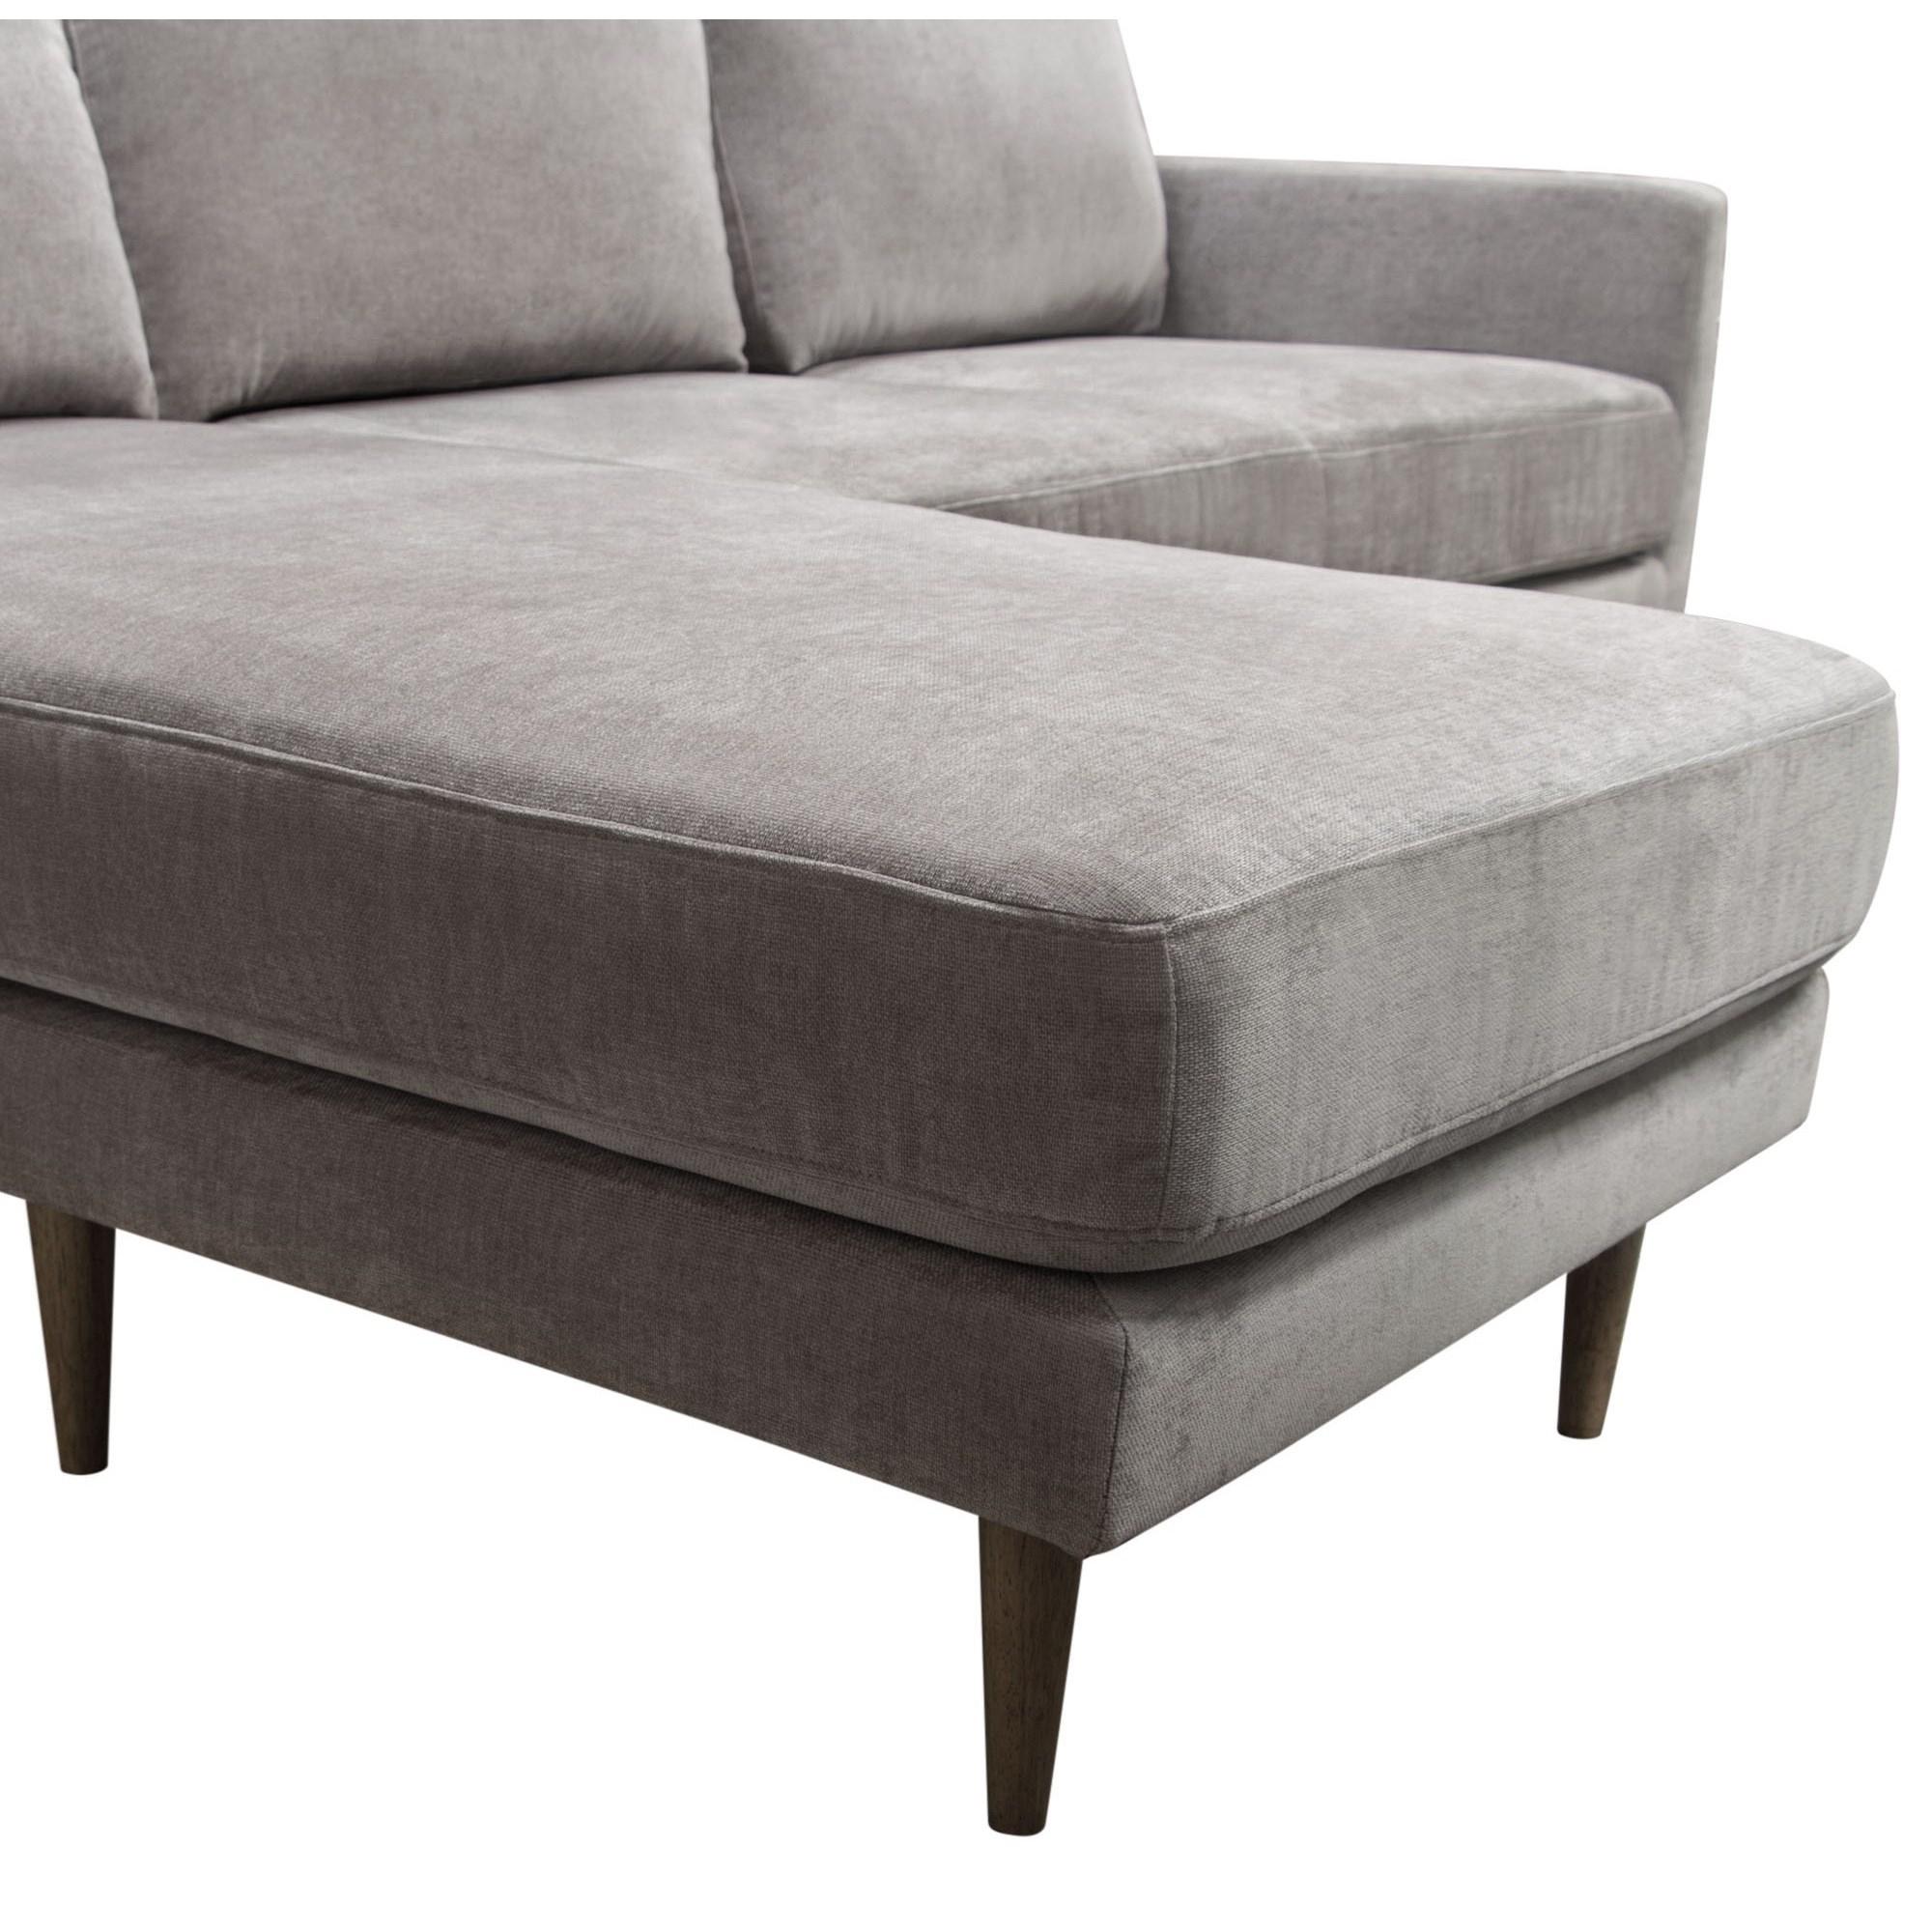 2018 Verona Mid Century Reversible Sectional Sofas Throughout Diamond Sofa Furniture Kelsey Kelseysegr Mid Century (View 19 of 20)